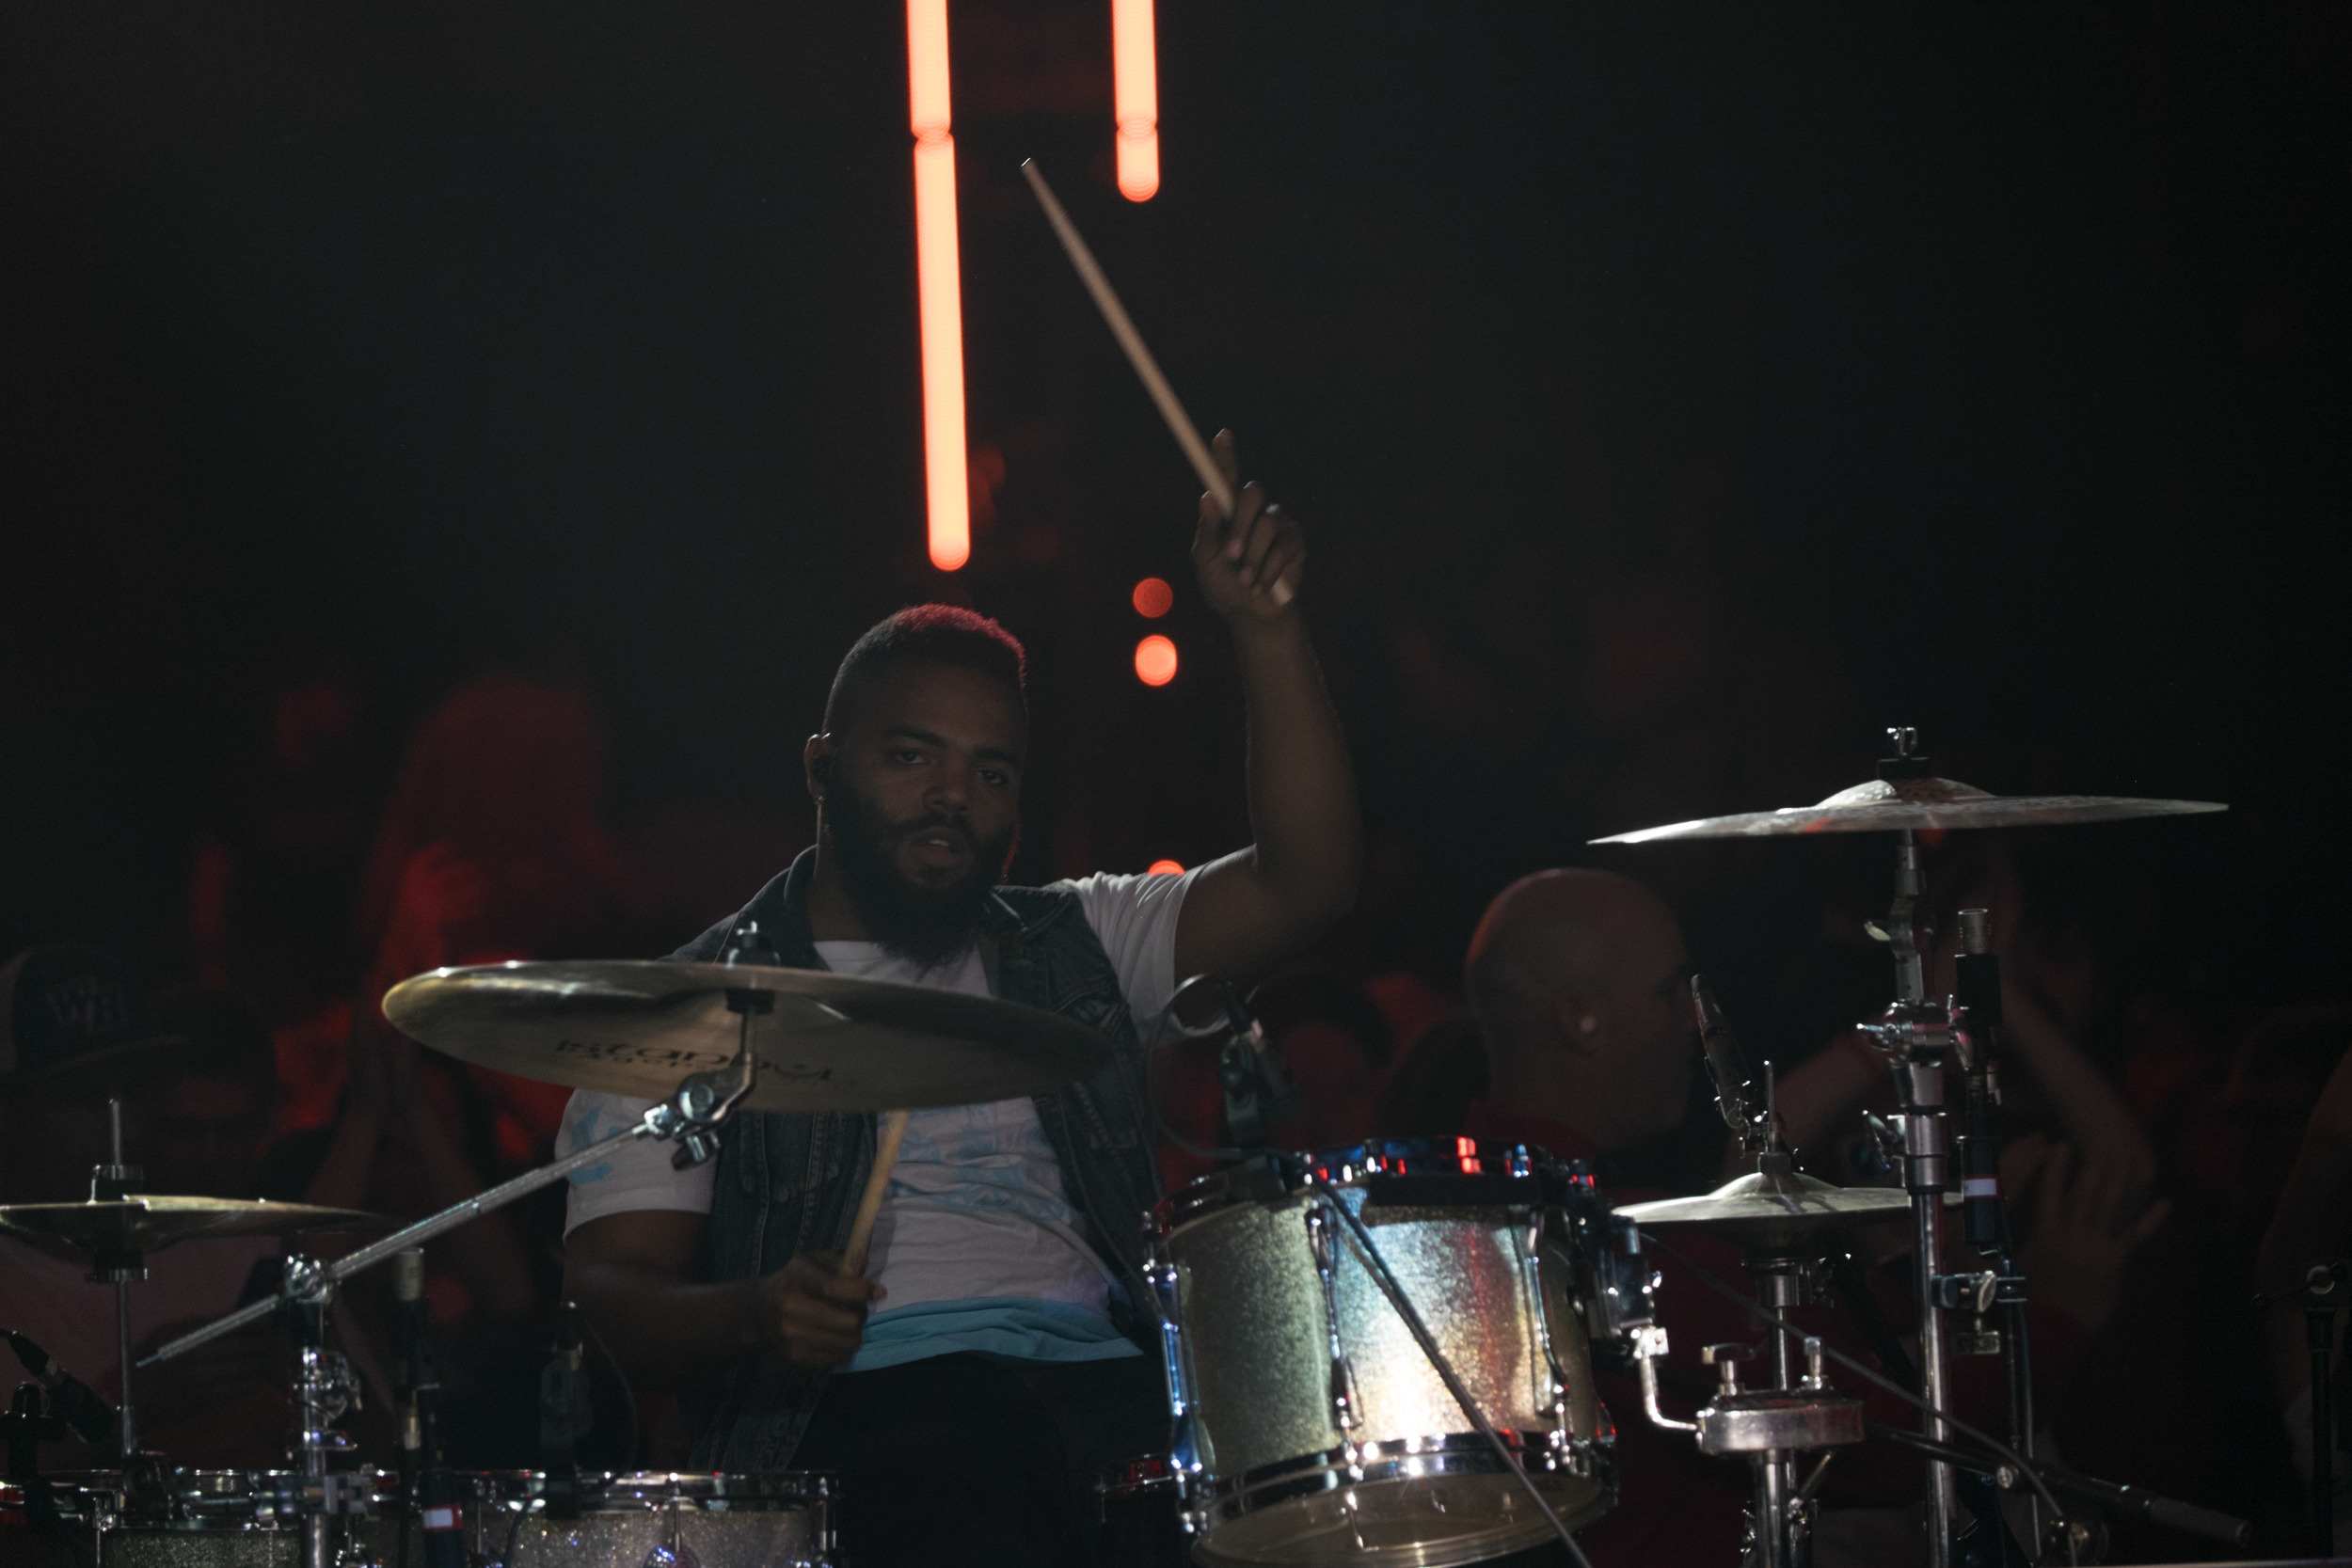 Rock_Worship_Roadshow-60.jpg